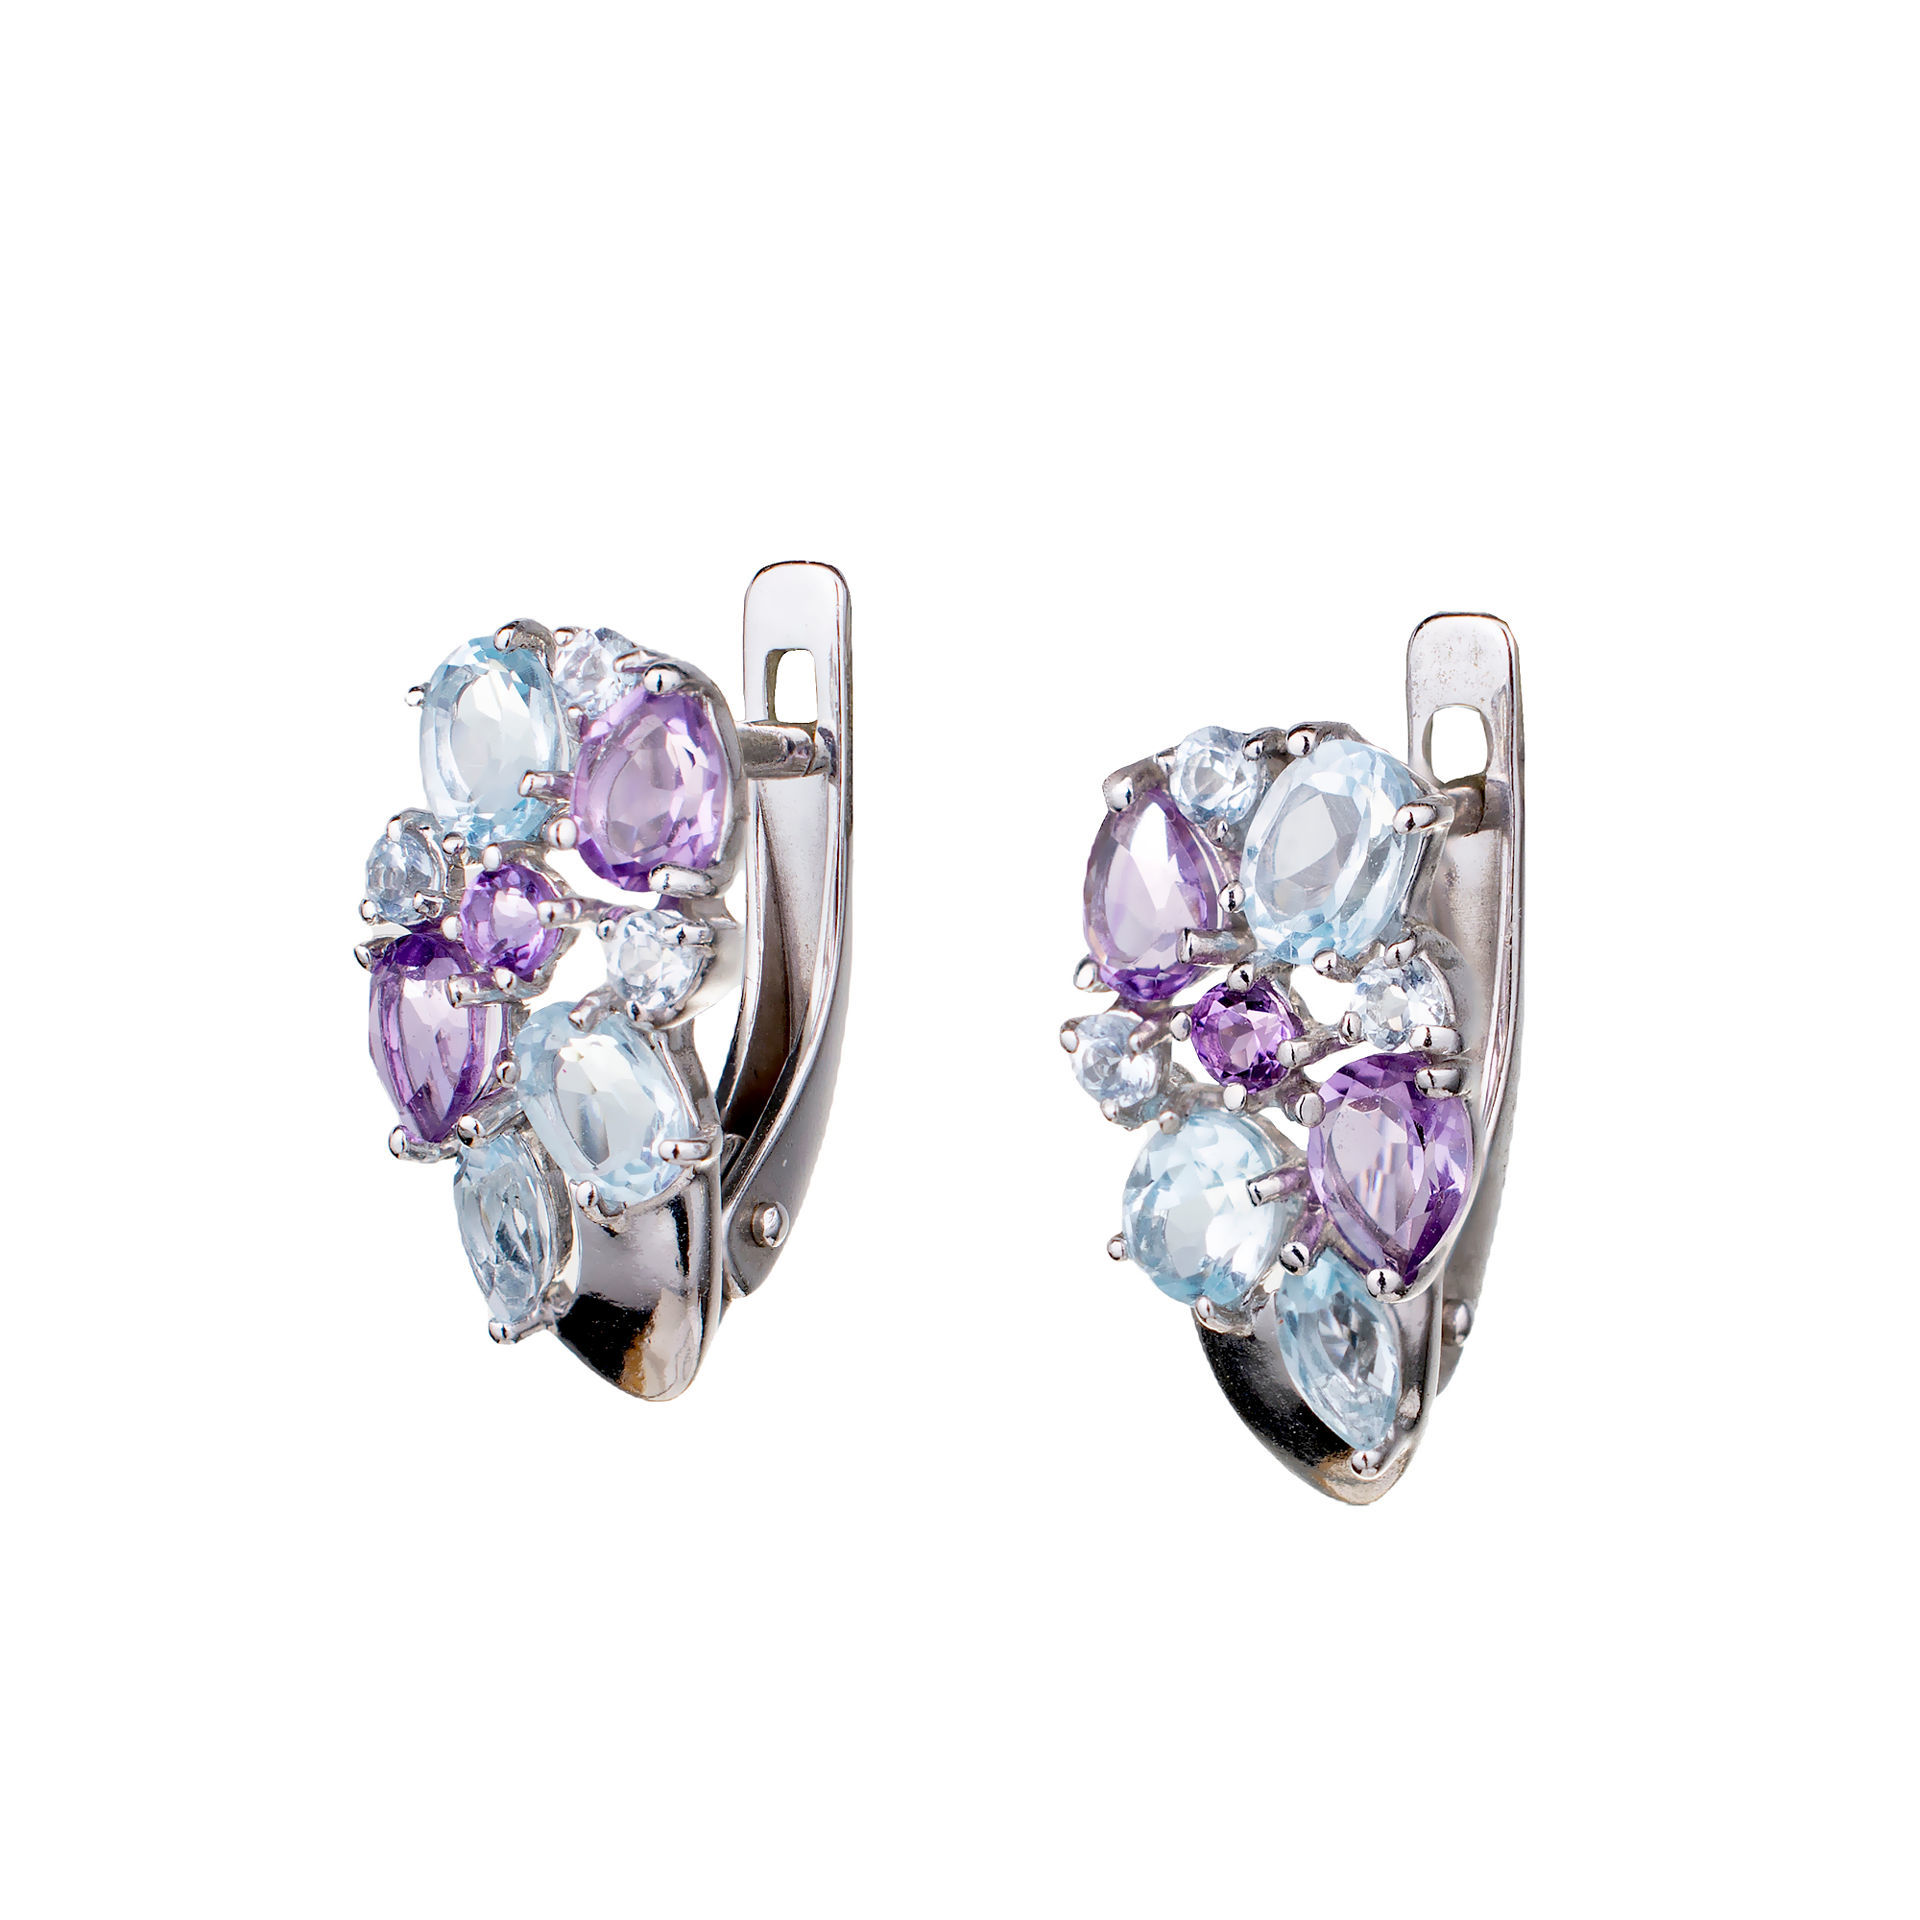 925 Silver Amethyst and Blue Topaz Stud Earrings Set of 2